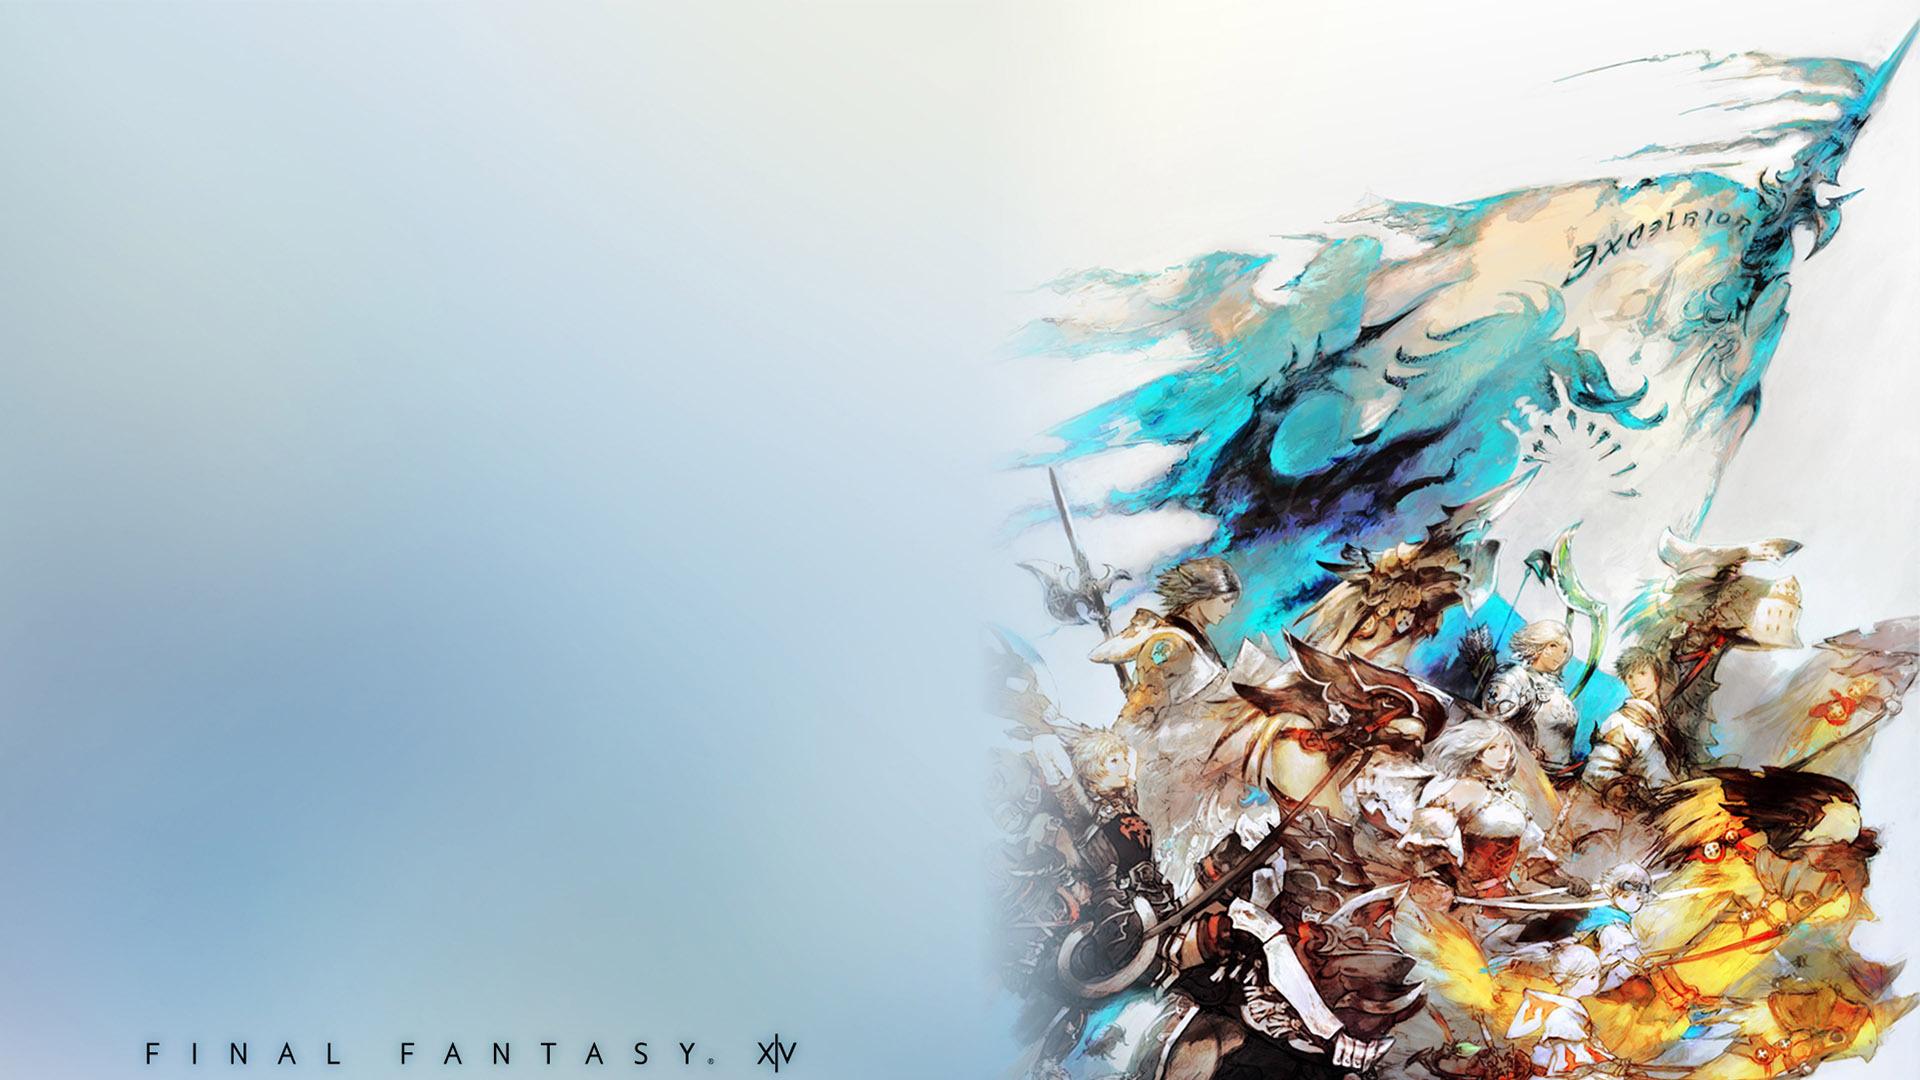 Download Free Final Fantasy Wallpapers 15 Beautiful: Final Fantasy 15 1080p Wallpaper